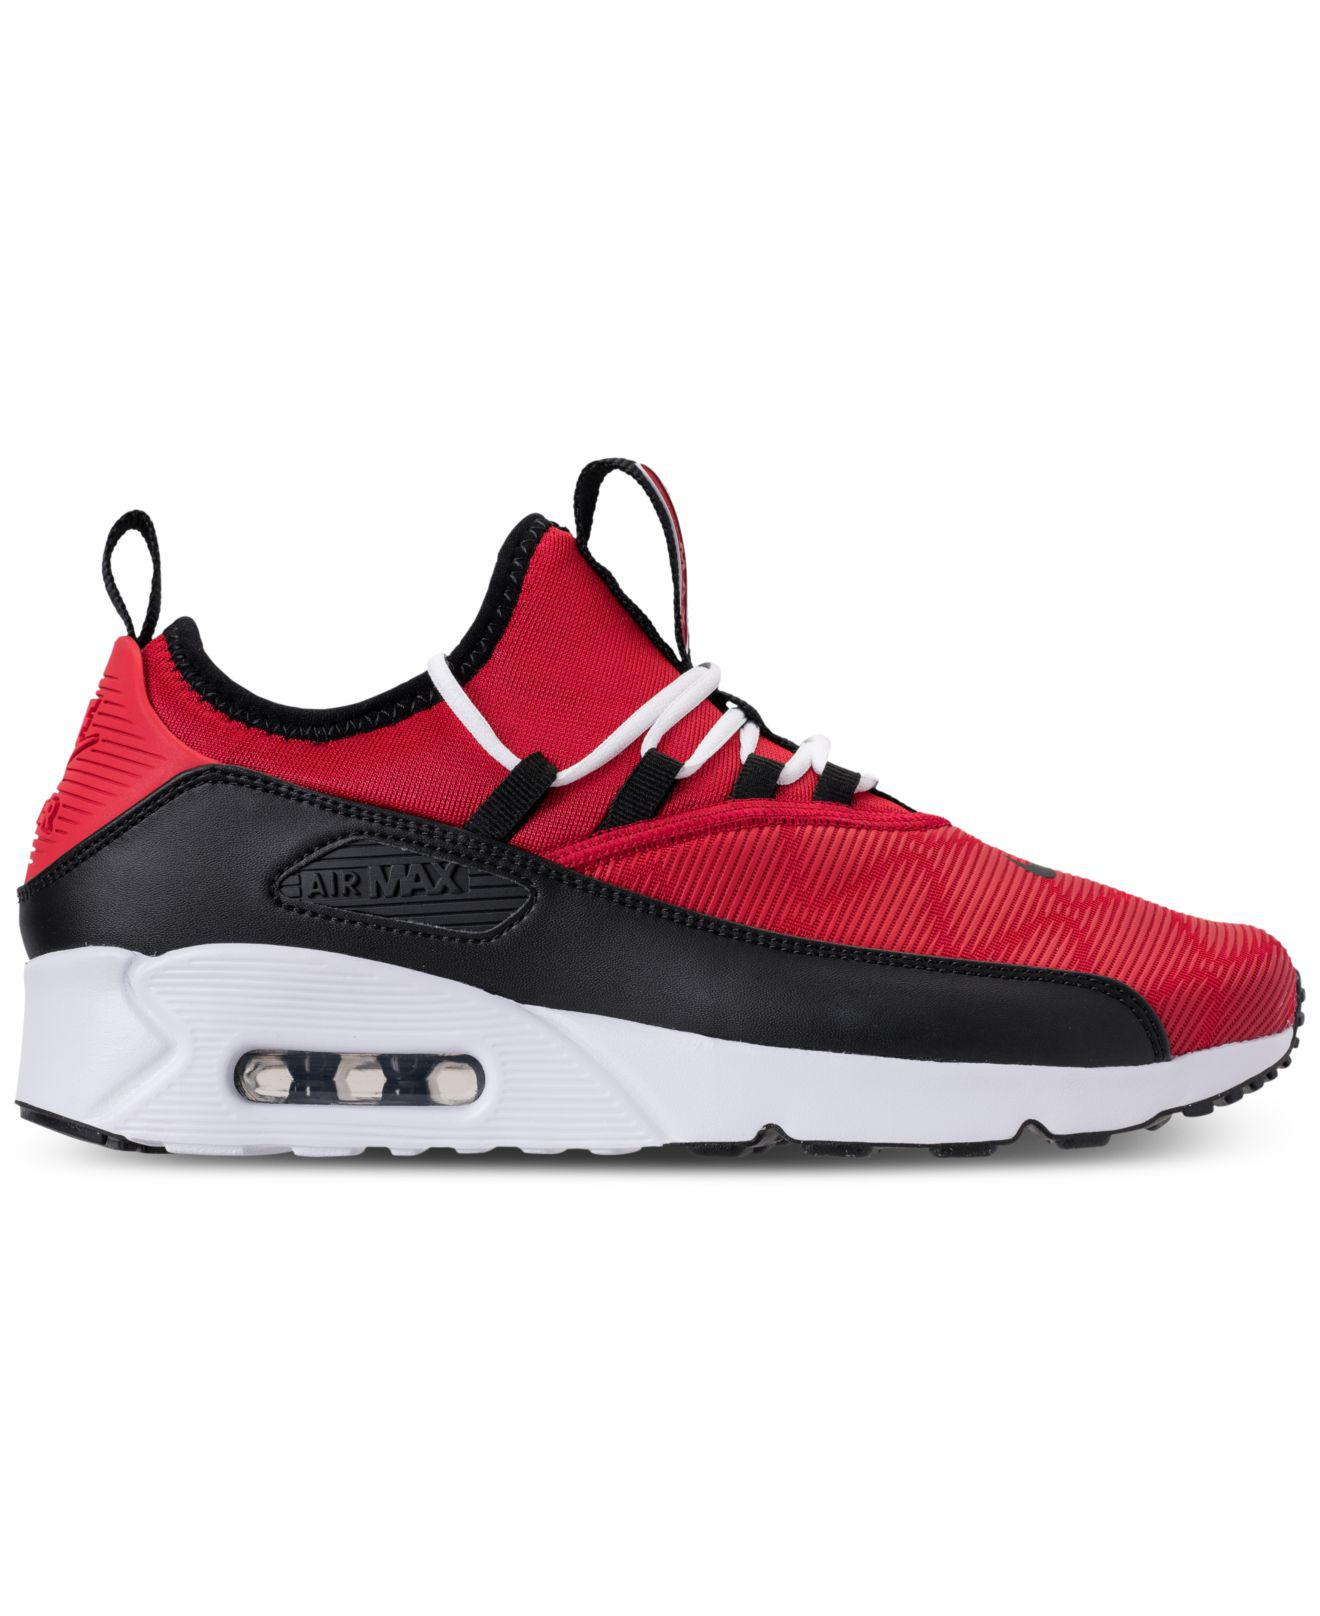 sports shoes 3b930 4da88 Gallery. Previously sold at Macys · Mens Air Max 90 ...